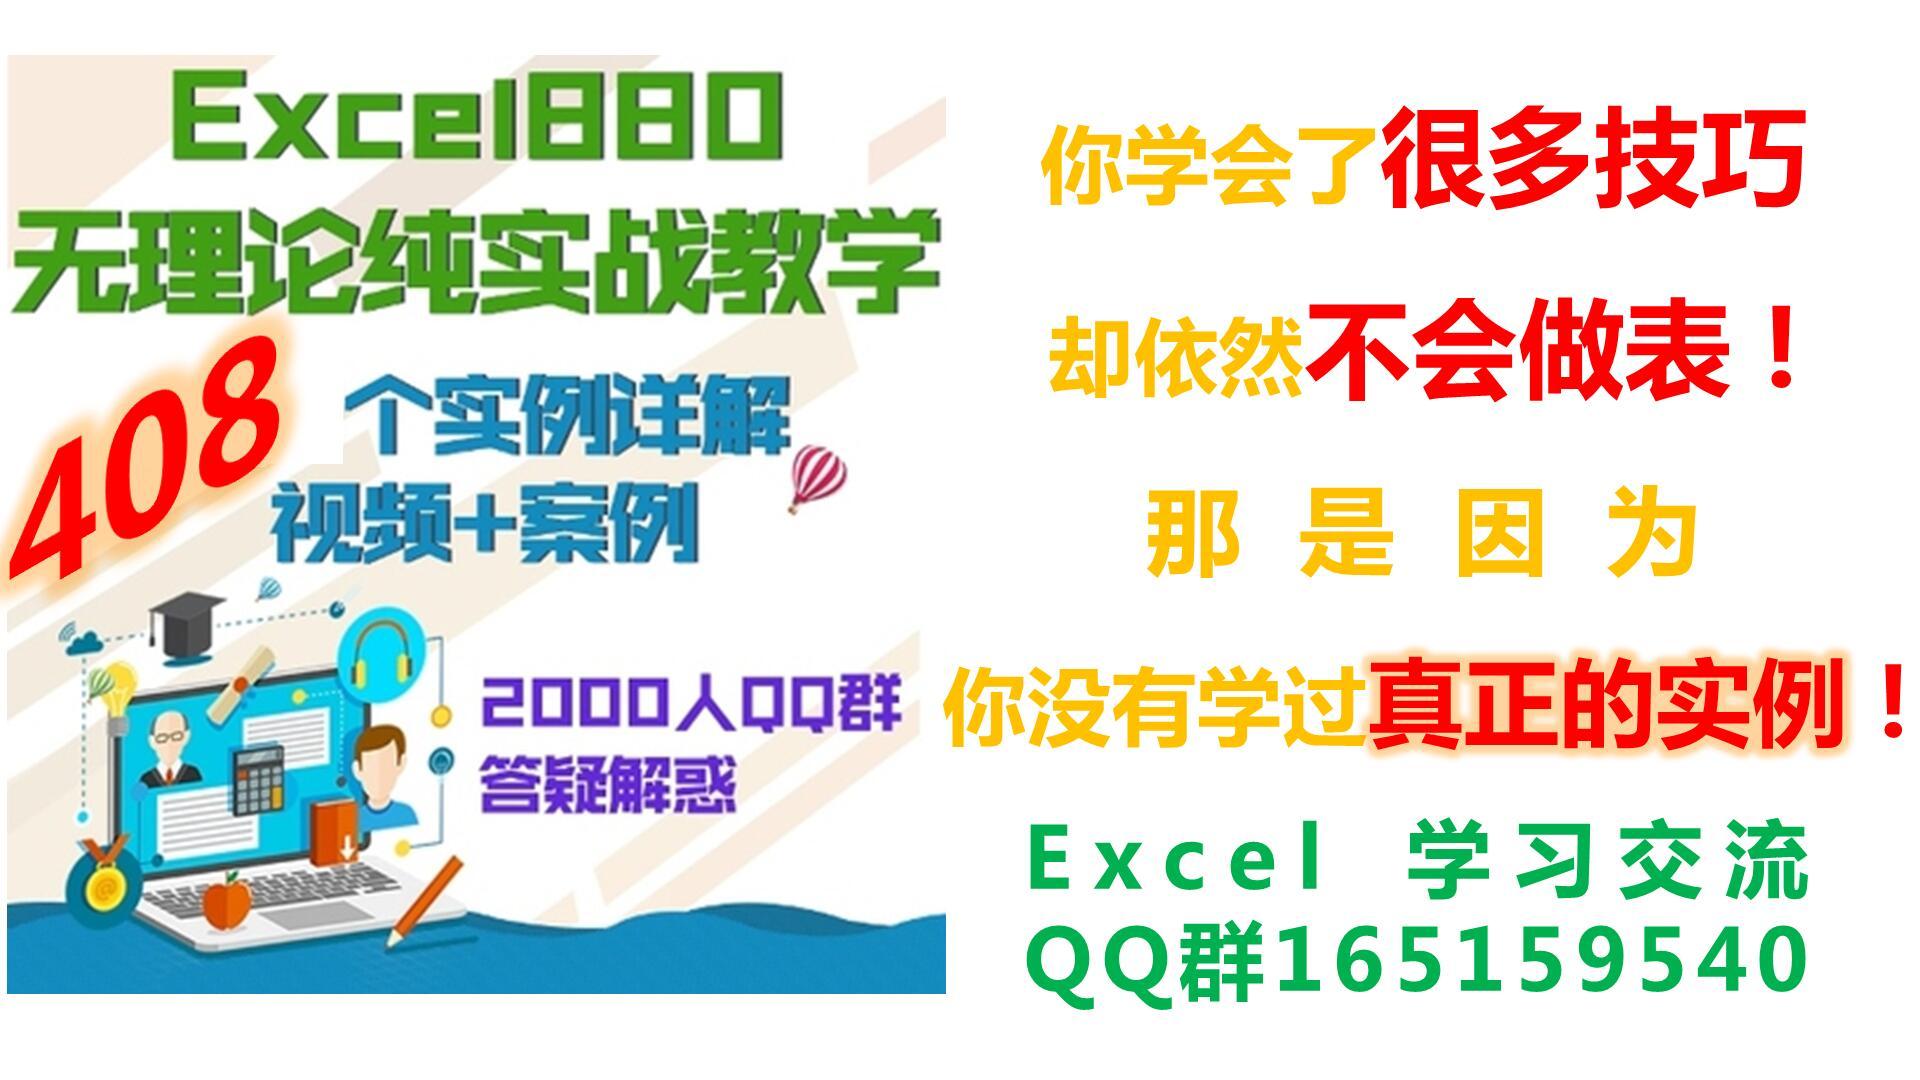 Excel实战密码408例 无理论纯实战 零基础极速入门 小菜鸟快速提高 函数 操作 图表 培训 案例 Exce880实例视频教程